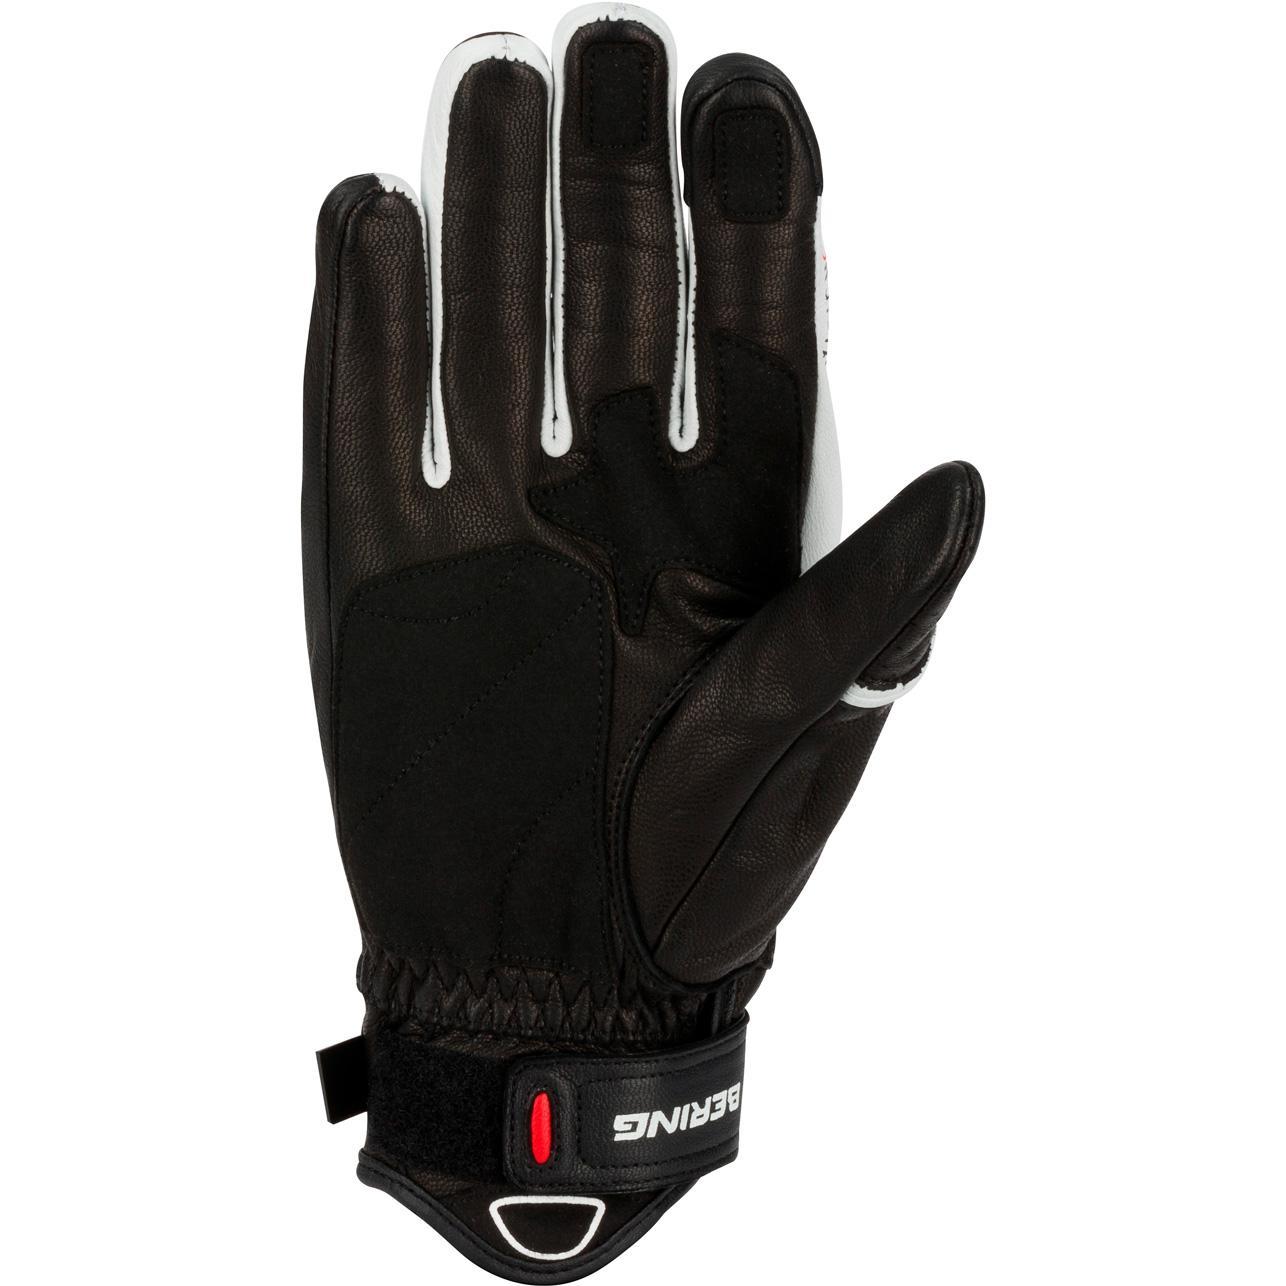 BERING-gants-alfred-image-10685722